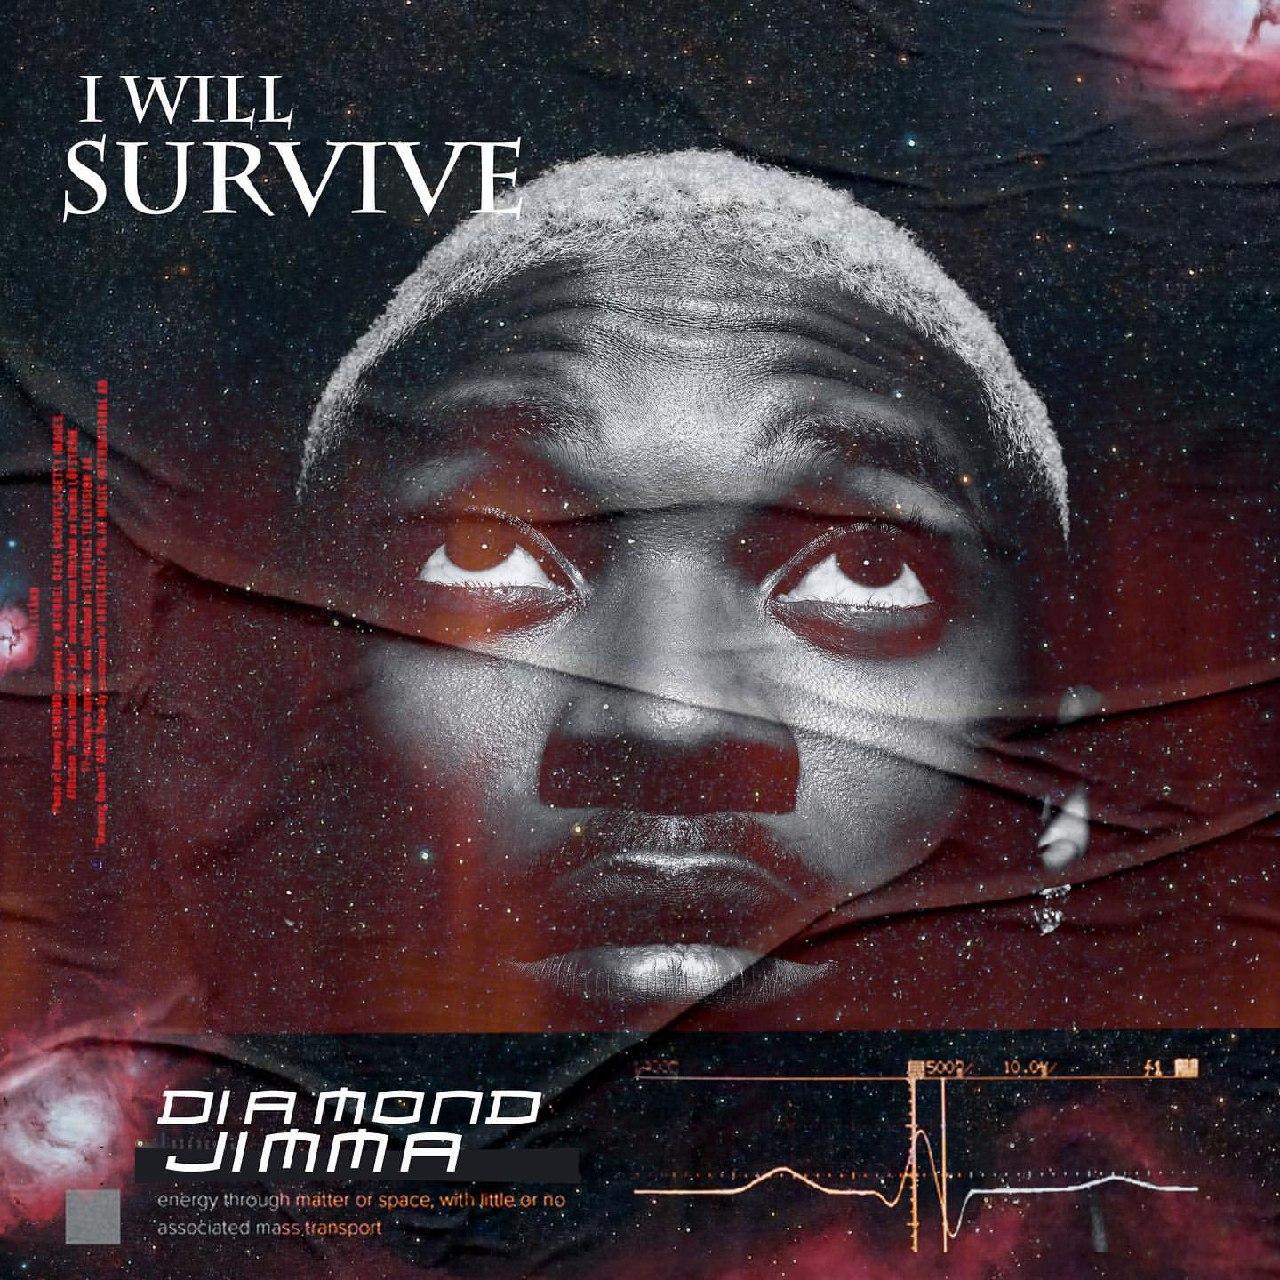 [Music] Diamond Jimma – I Will Survive